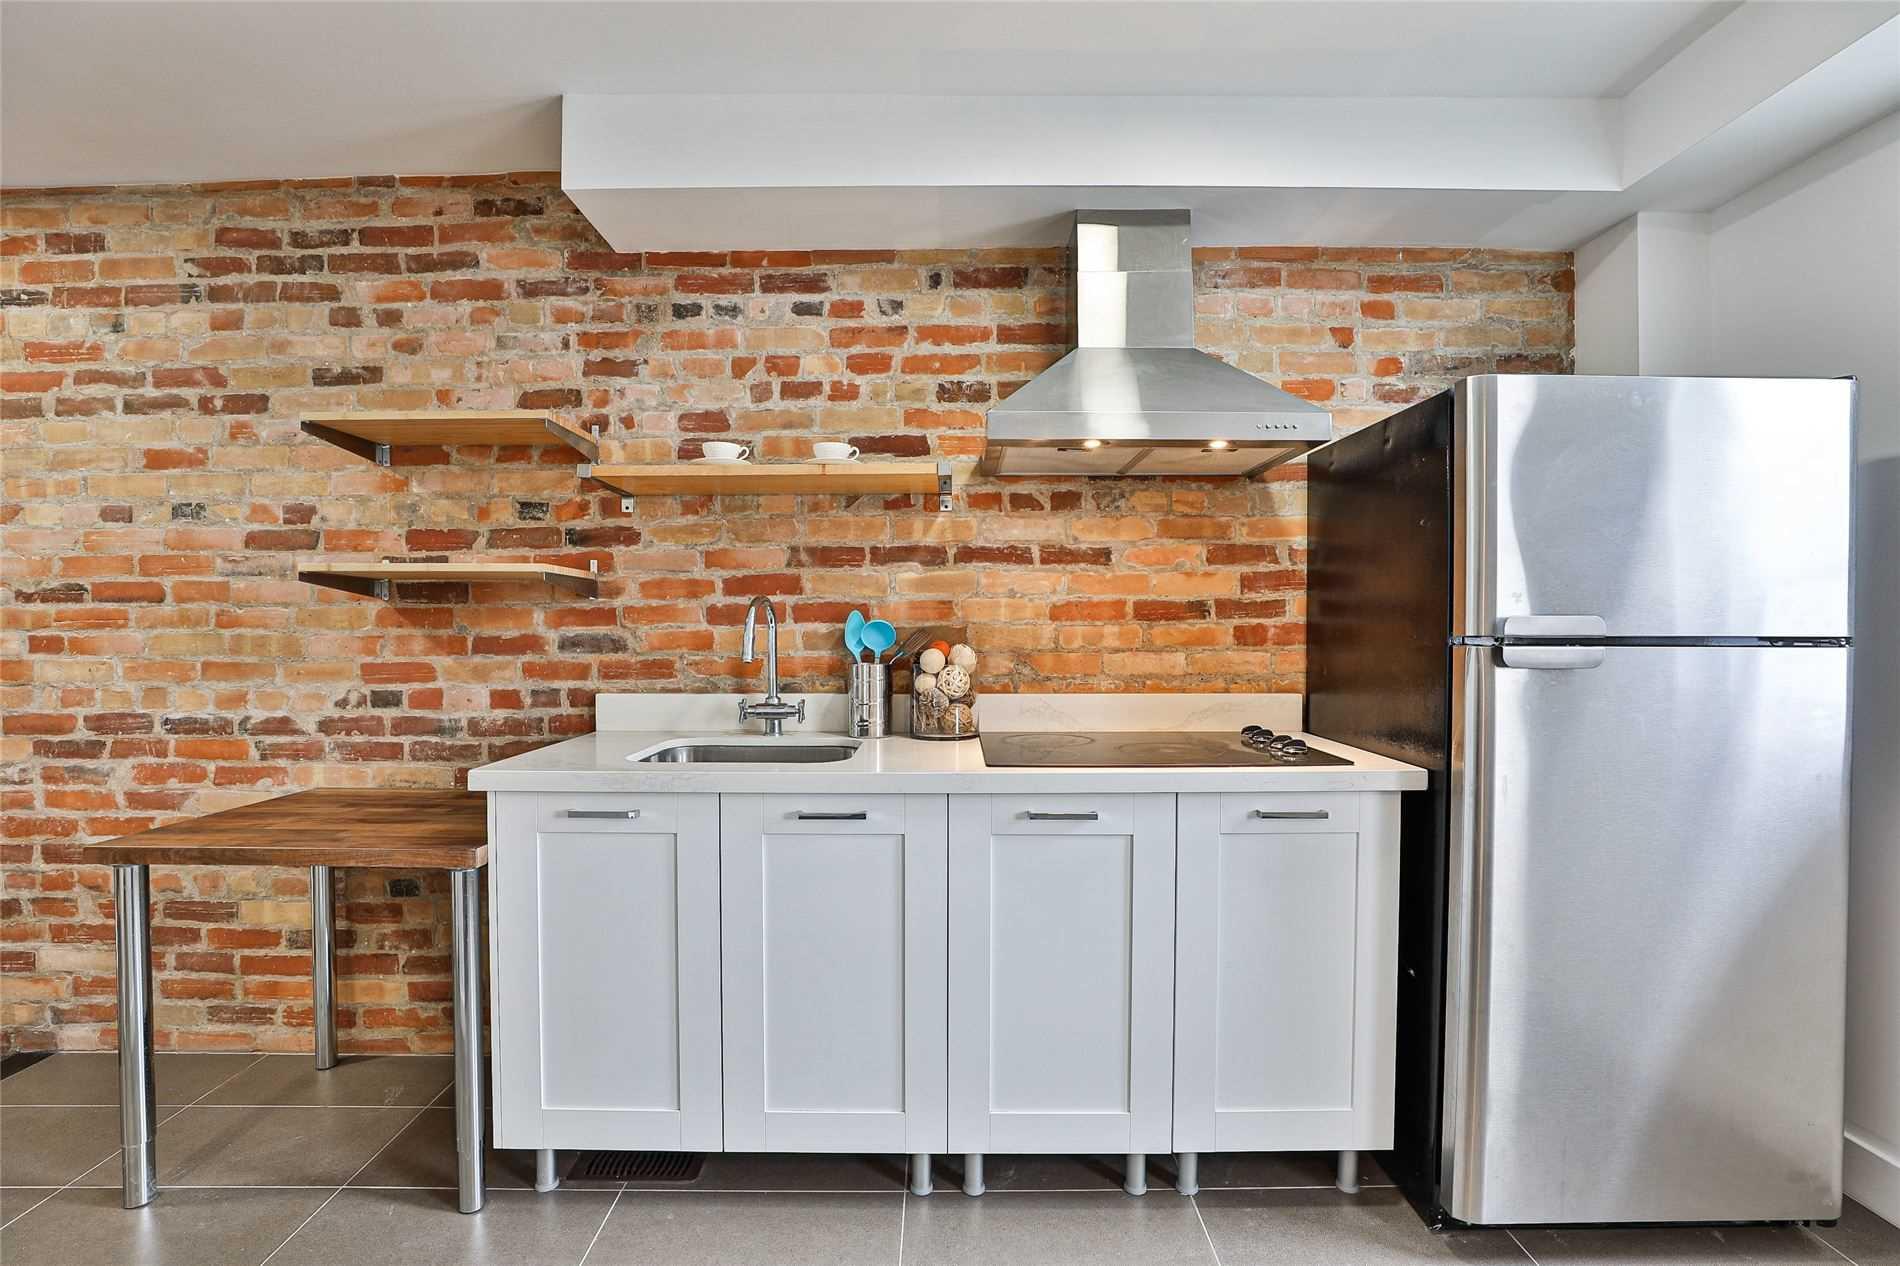 Semi-Detached For Sale In Toronto , 5 Bedrooms Bedrooms, ,5 BathroomsBathrooms,Semi-Detached,For Sale,Grace